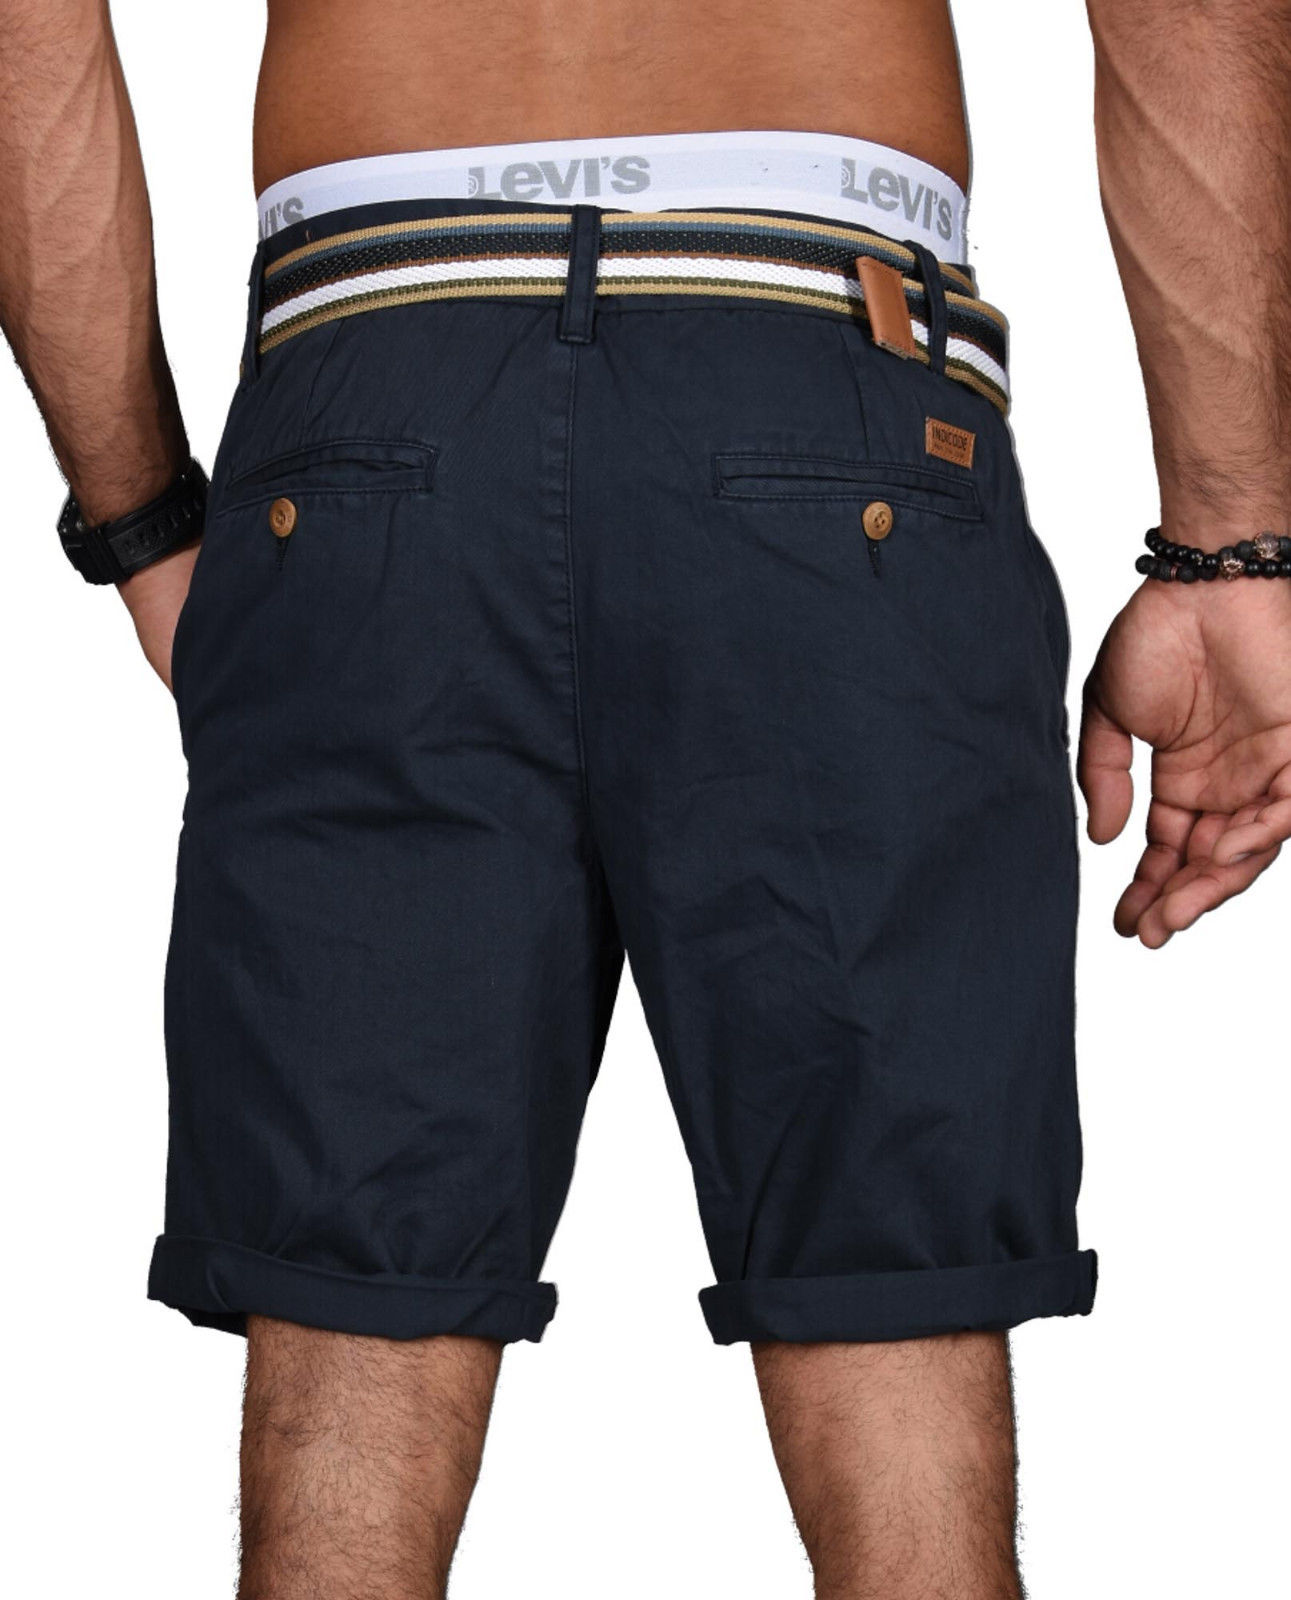 Indicode-Herren-Sommer-Bermuda-Chino-Shorts-kurze-Hose-Sommerhose-Short-NEU-B499 Indexbild 17